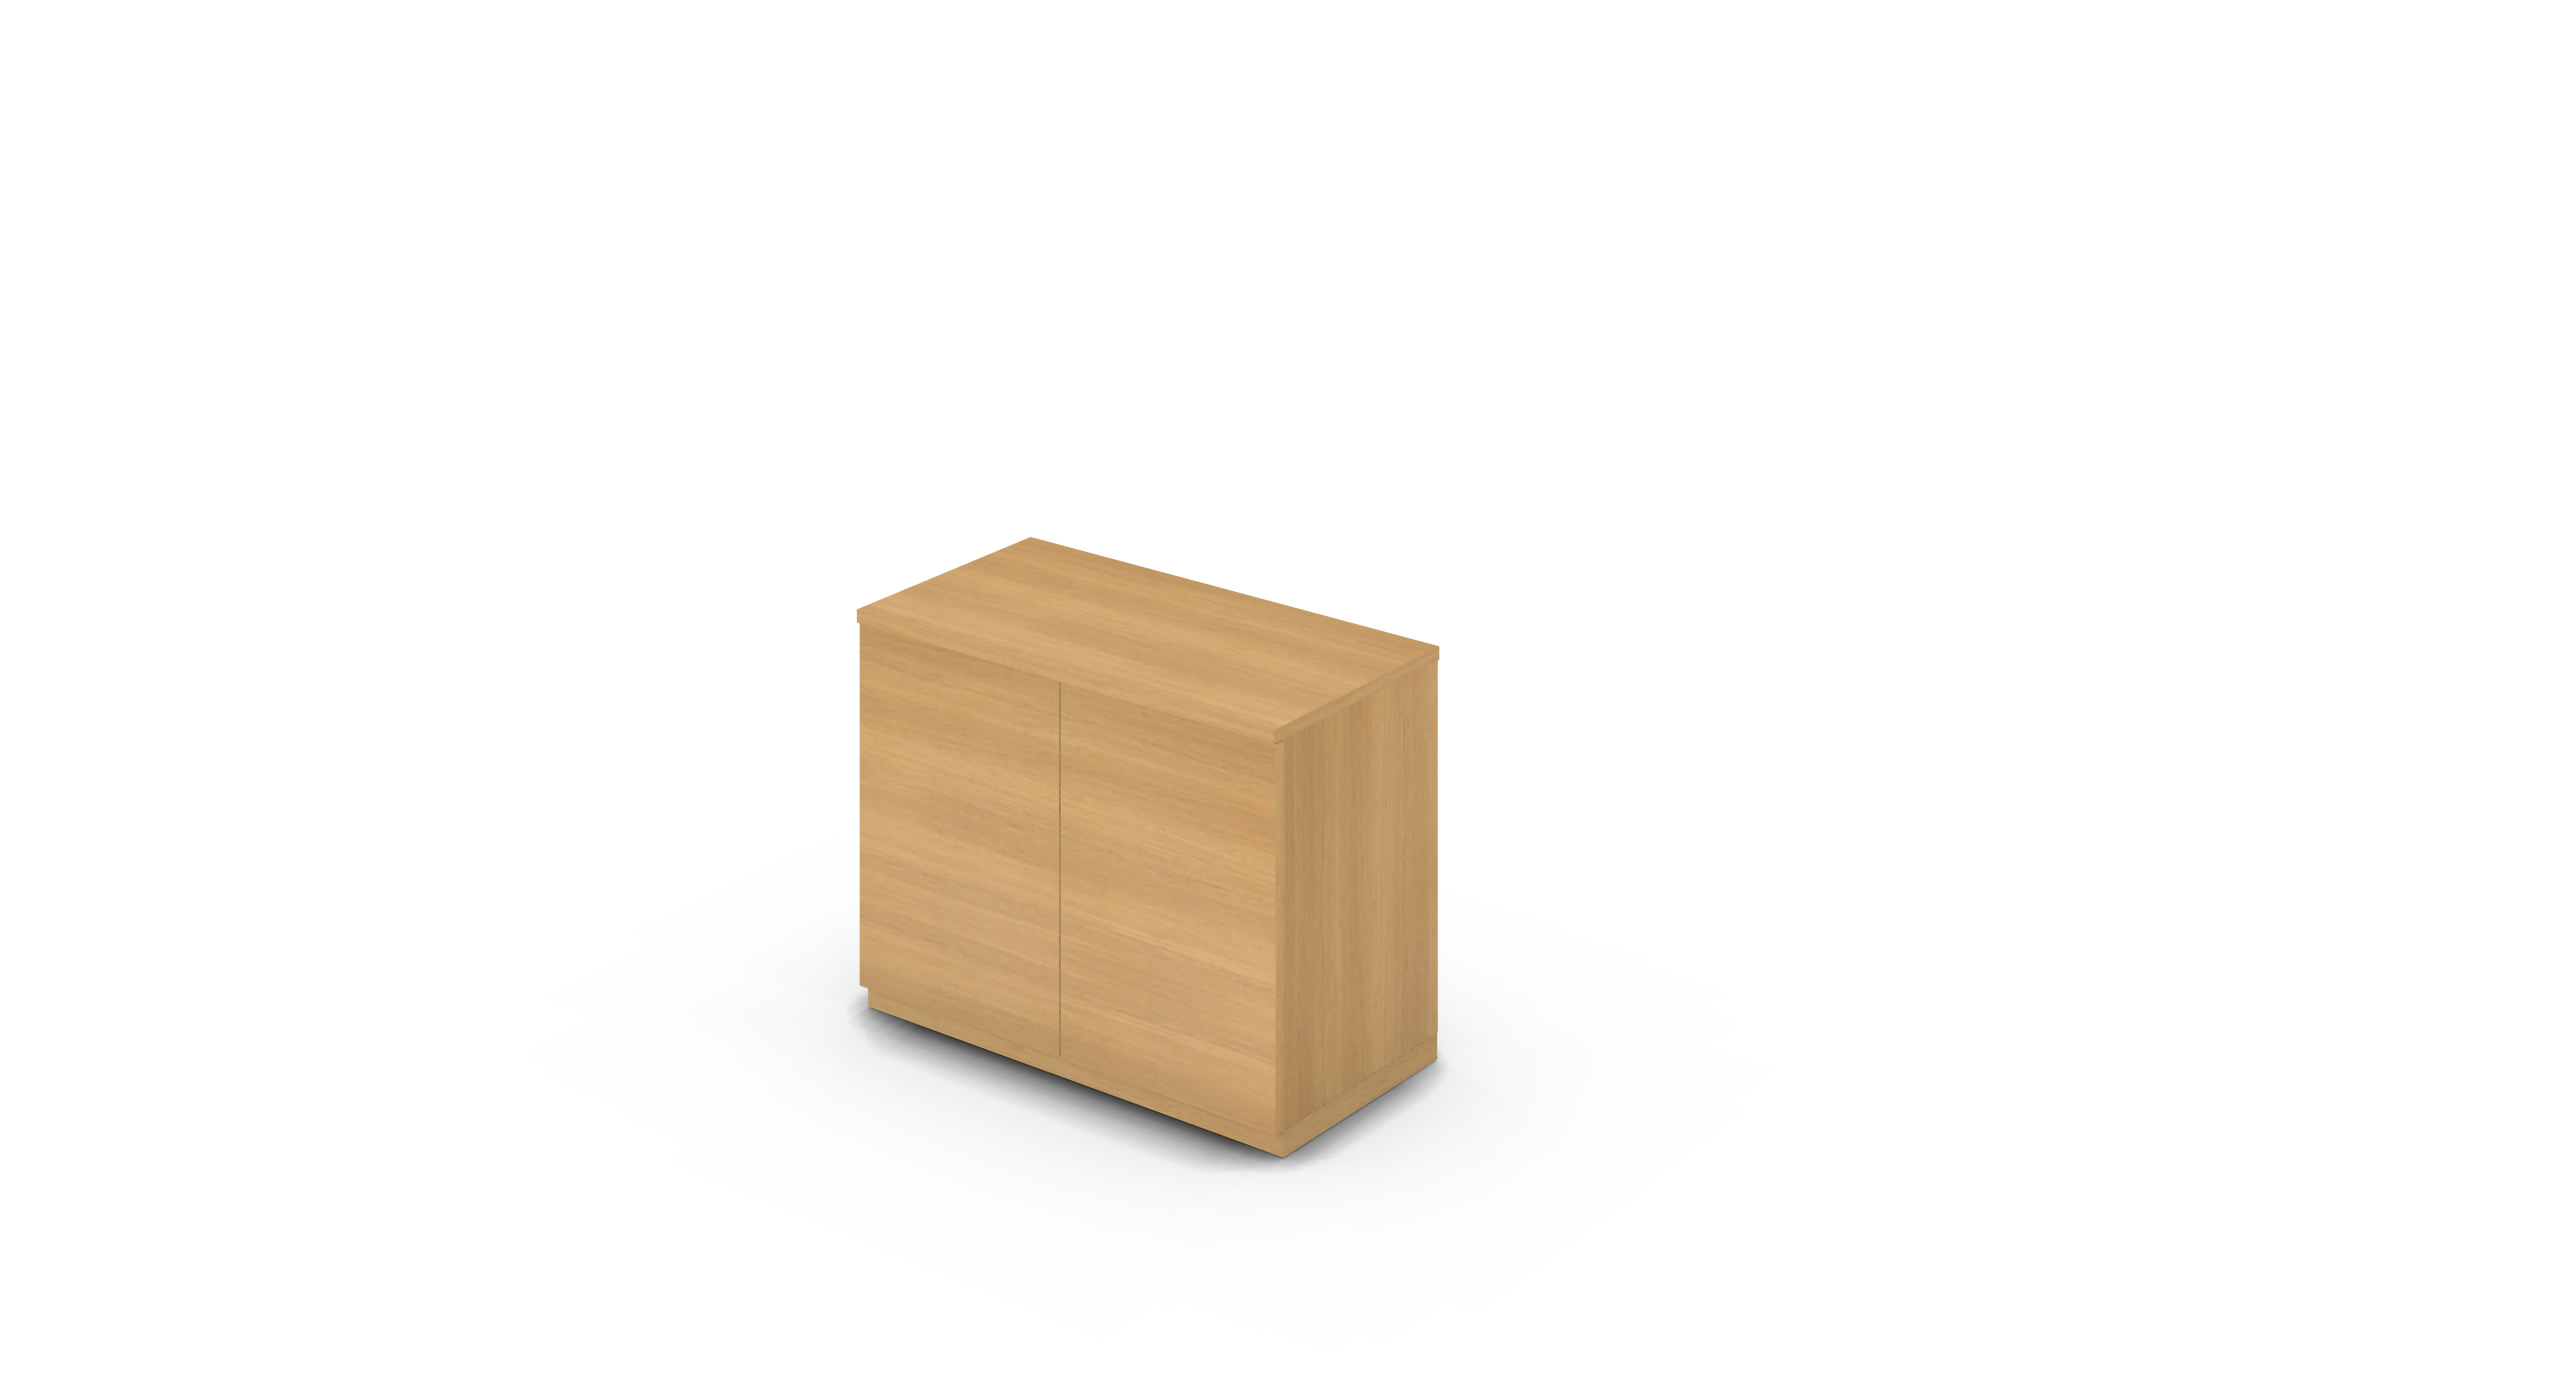 Cabinet_900x450x775_HD_Oak_Push_NoCylinder